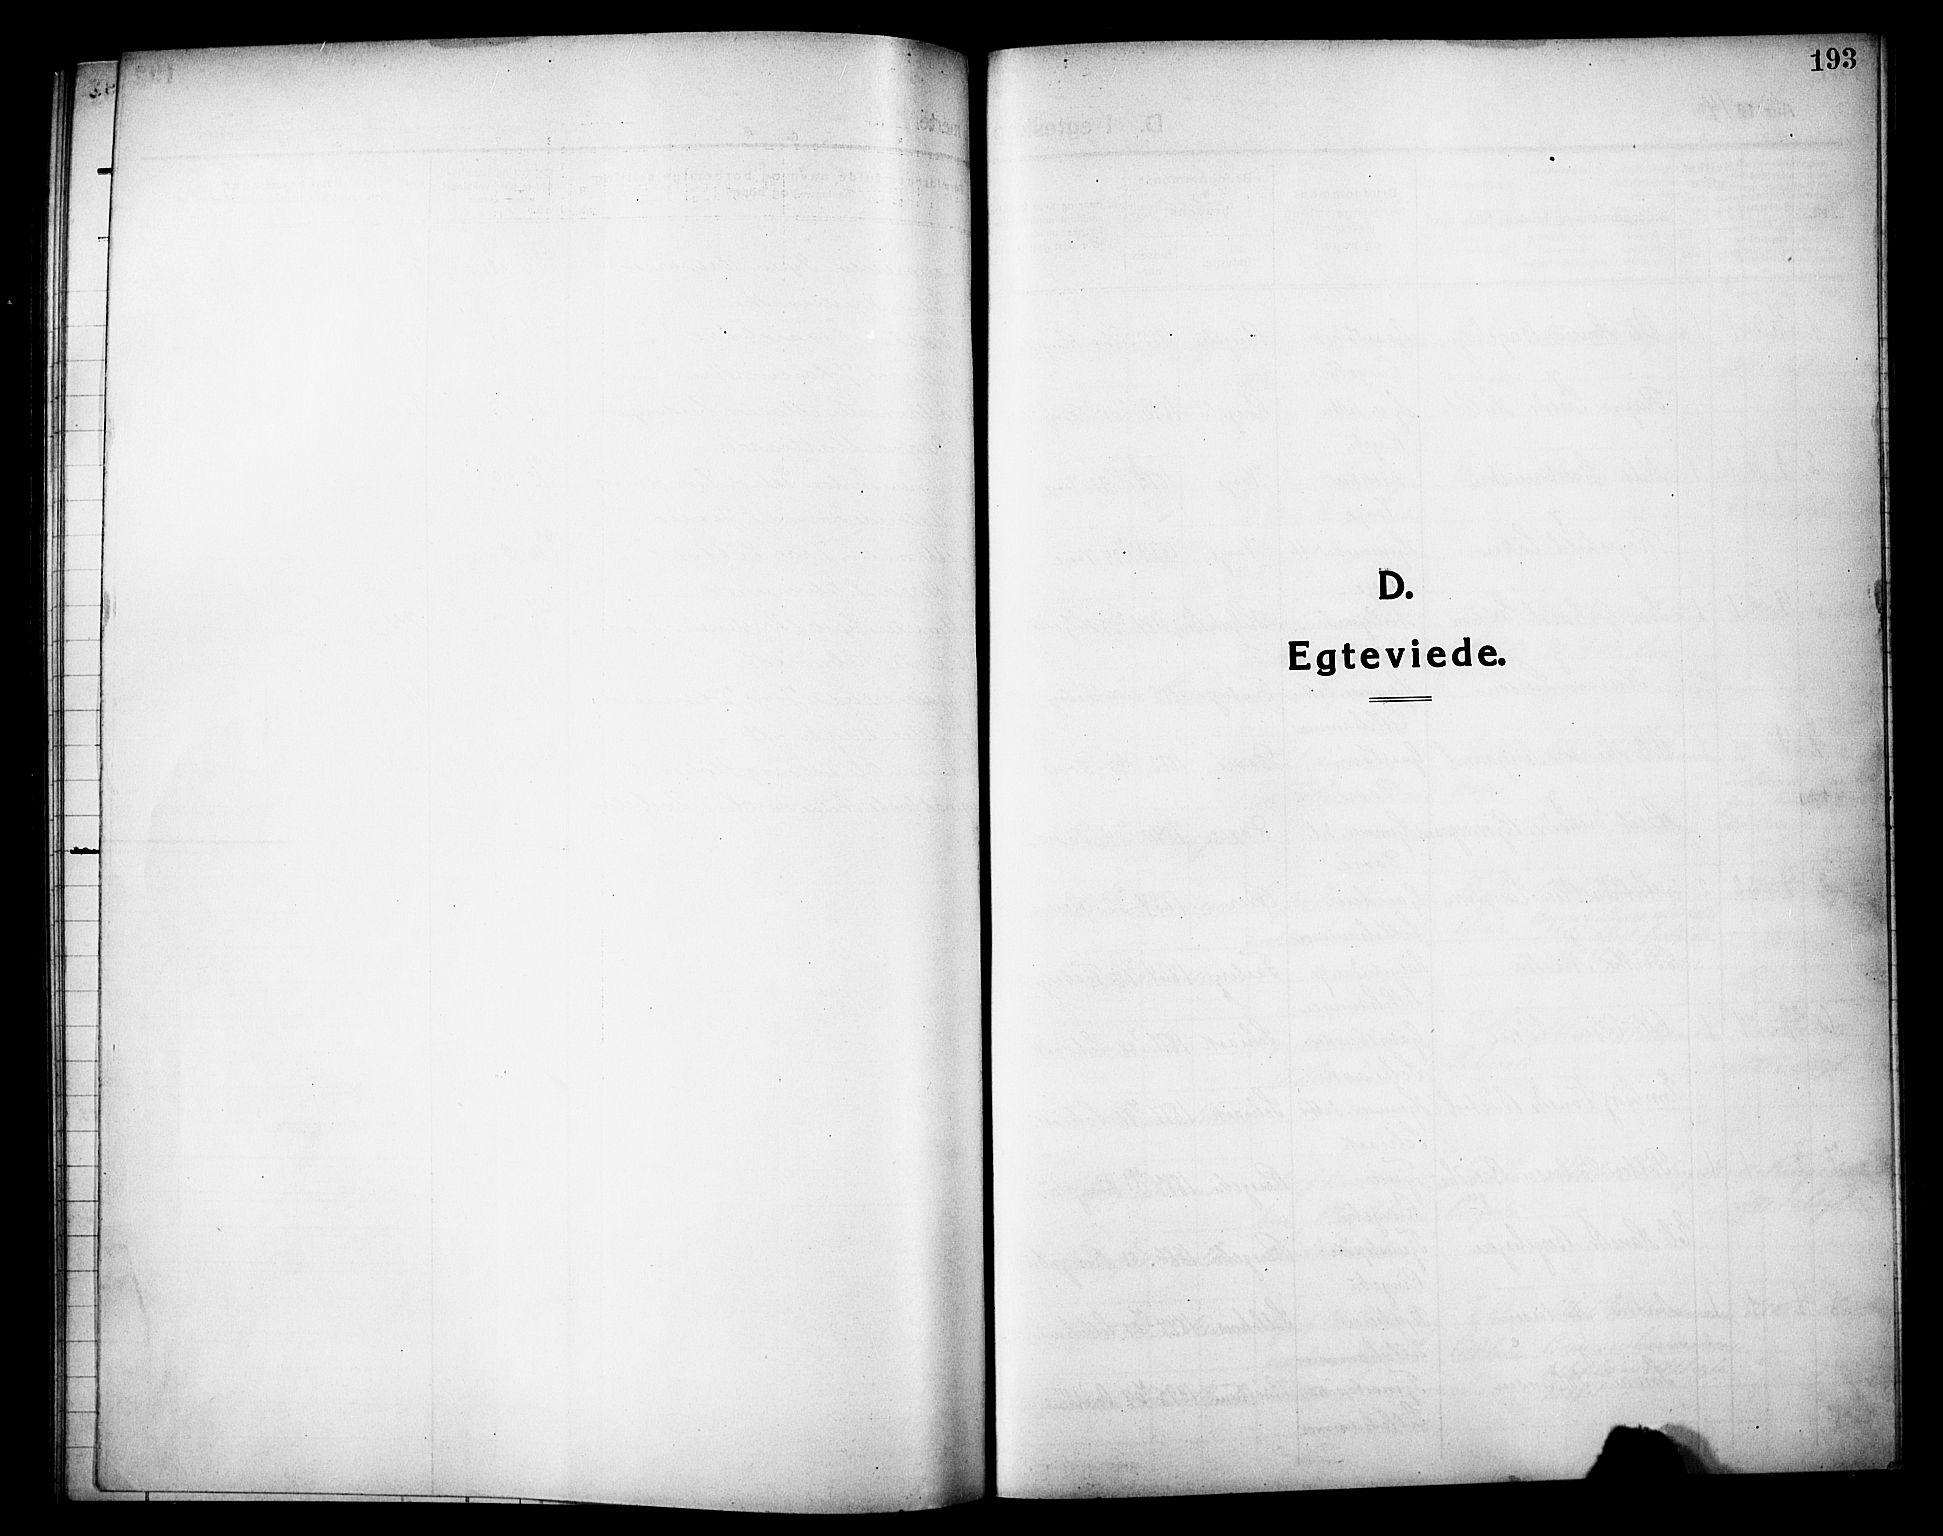 SAH, Lillehammer prestekontor, H/Ha/Hab/L0002: Parish register (copy) no. 2, 1913-1929, p. 193